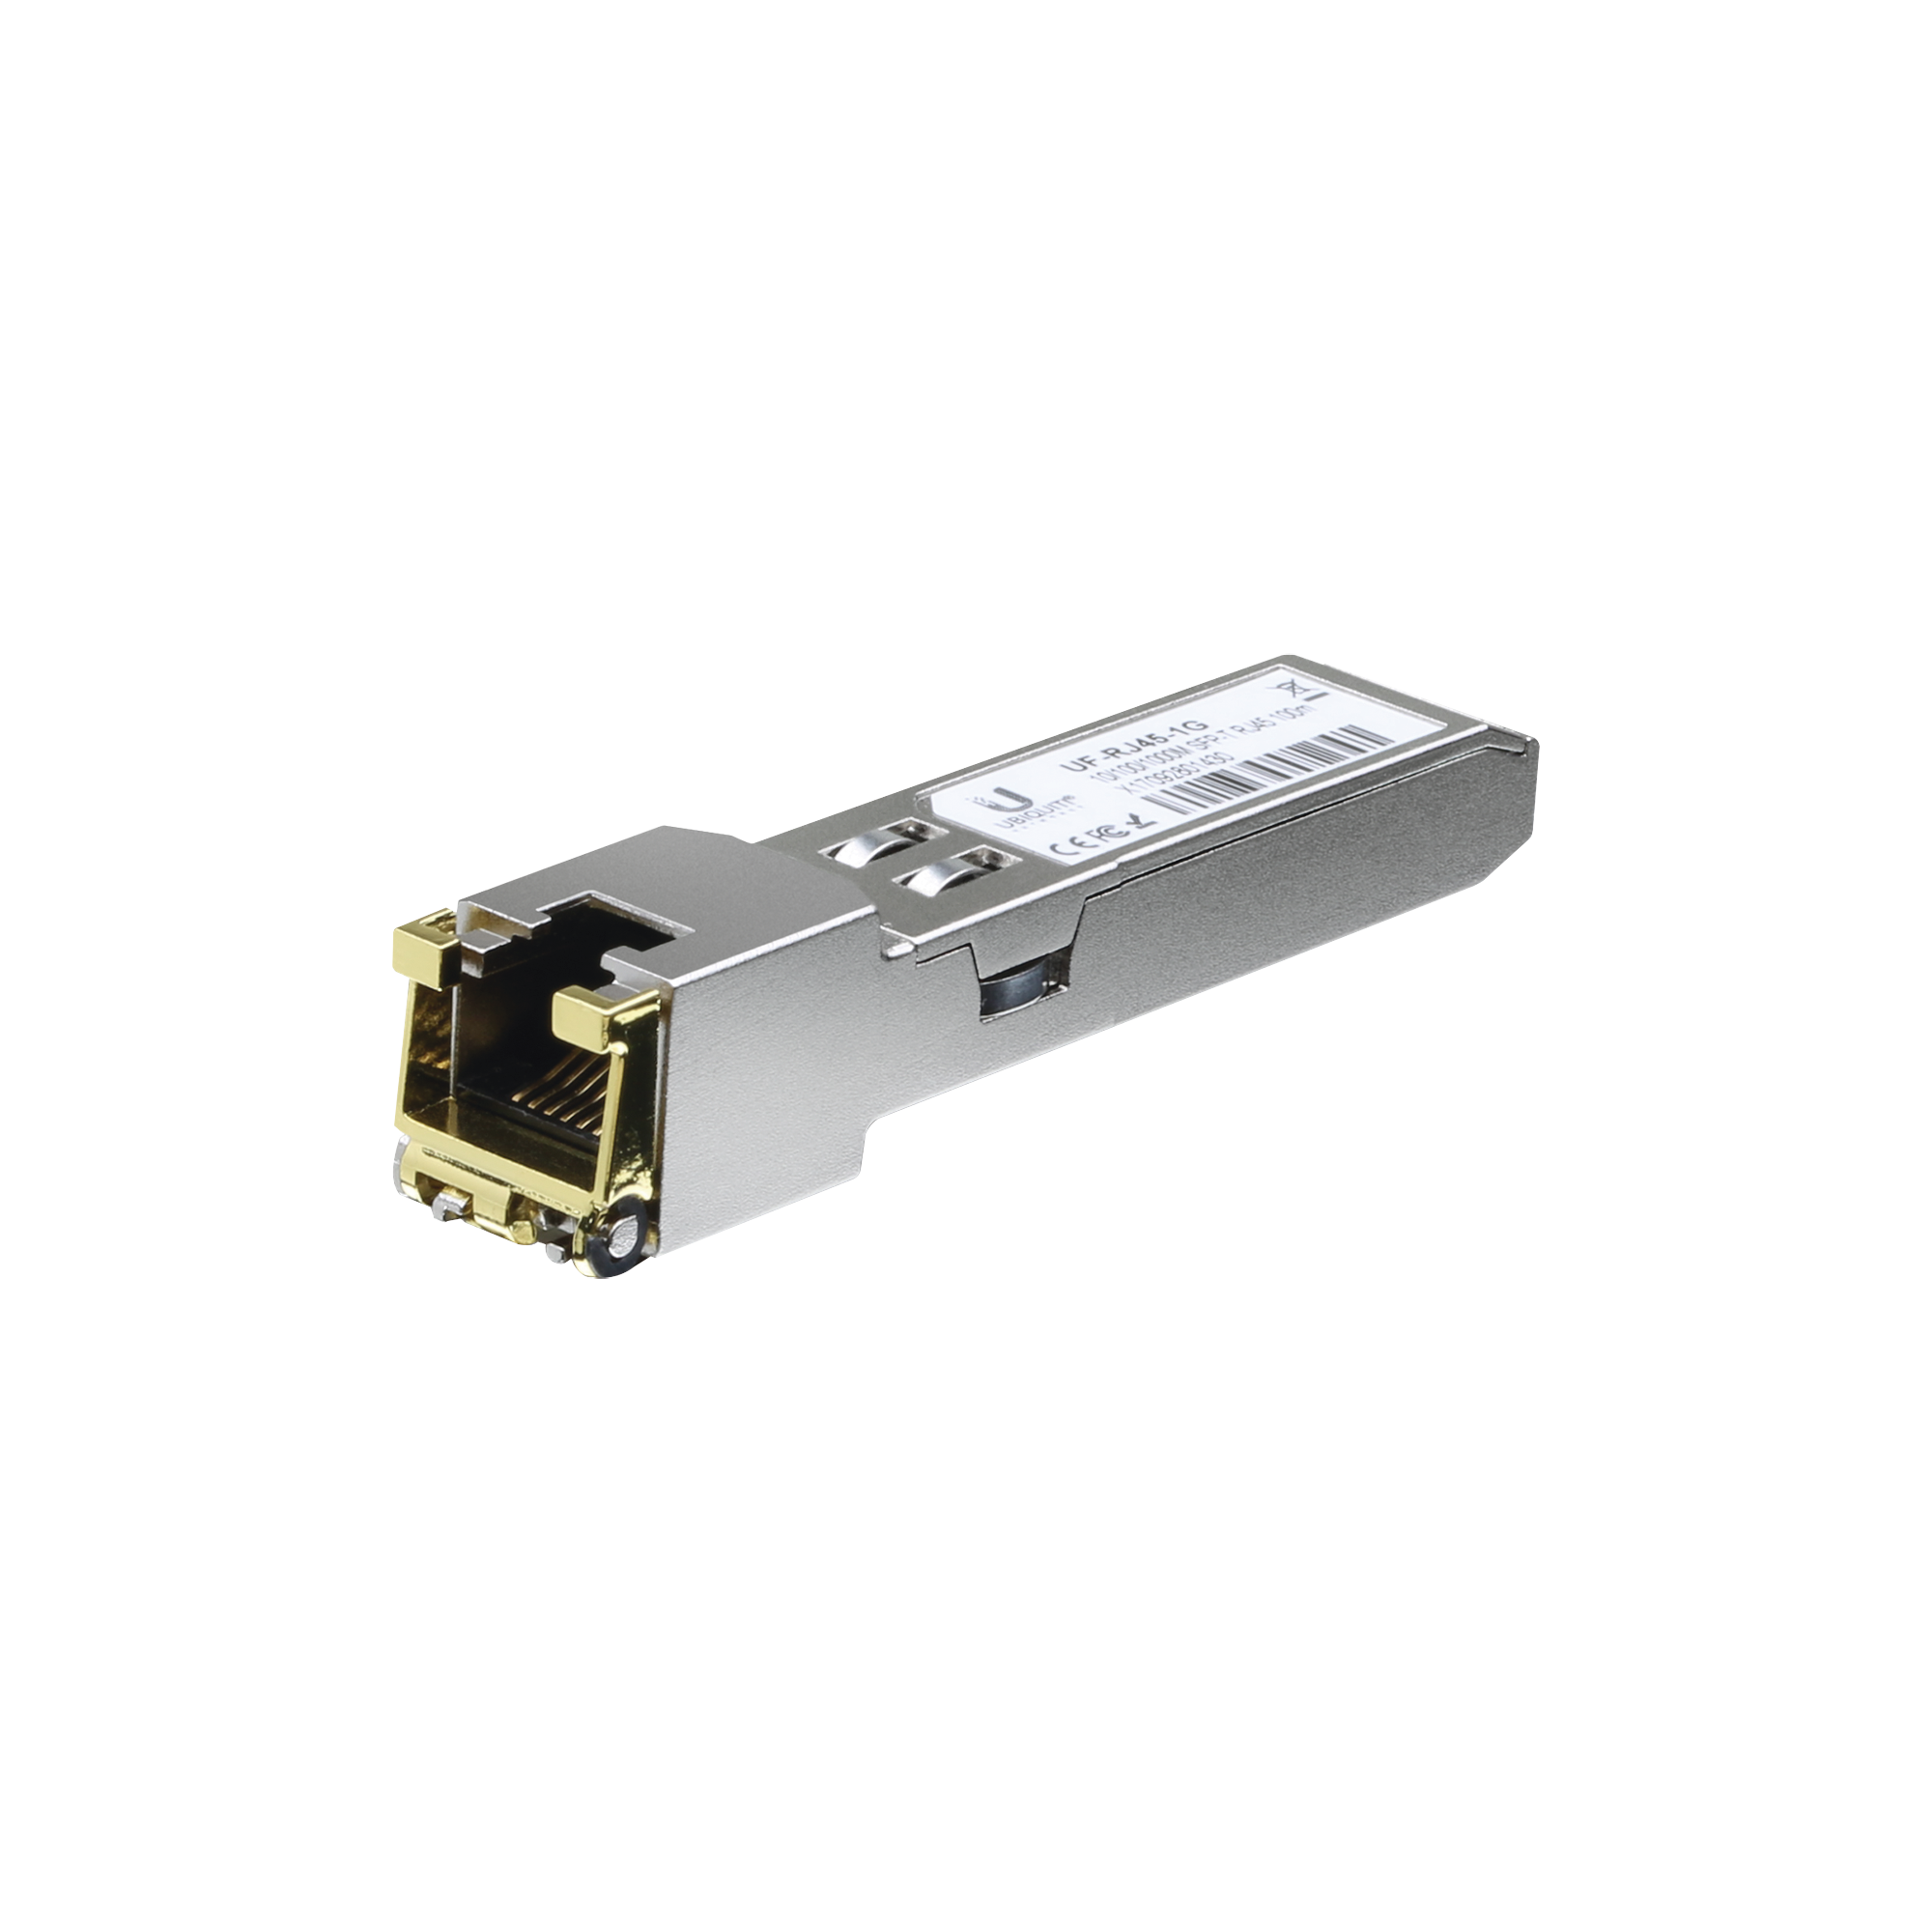 UFiber Módulo Ethernet RJ45 a SFP+ 1/10 Gbps, distancia hasta 100 m (1 Gbps) o 30 m (10 Gbps)